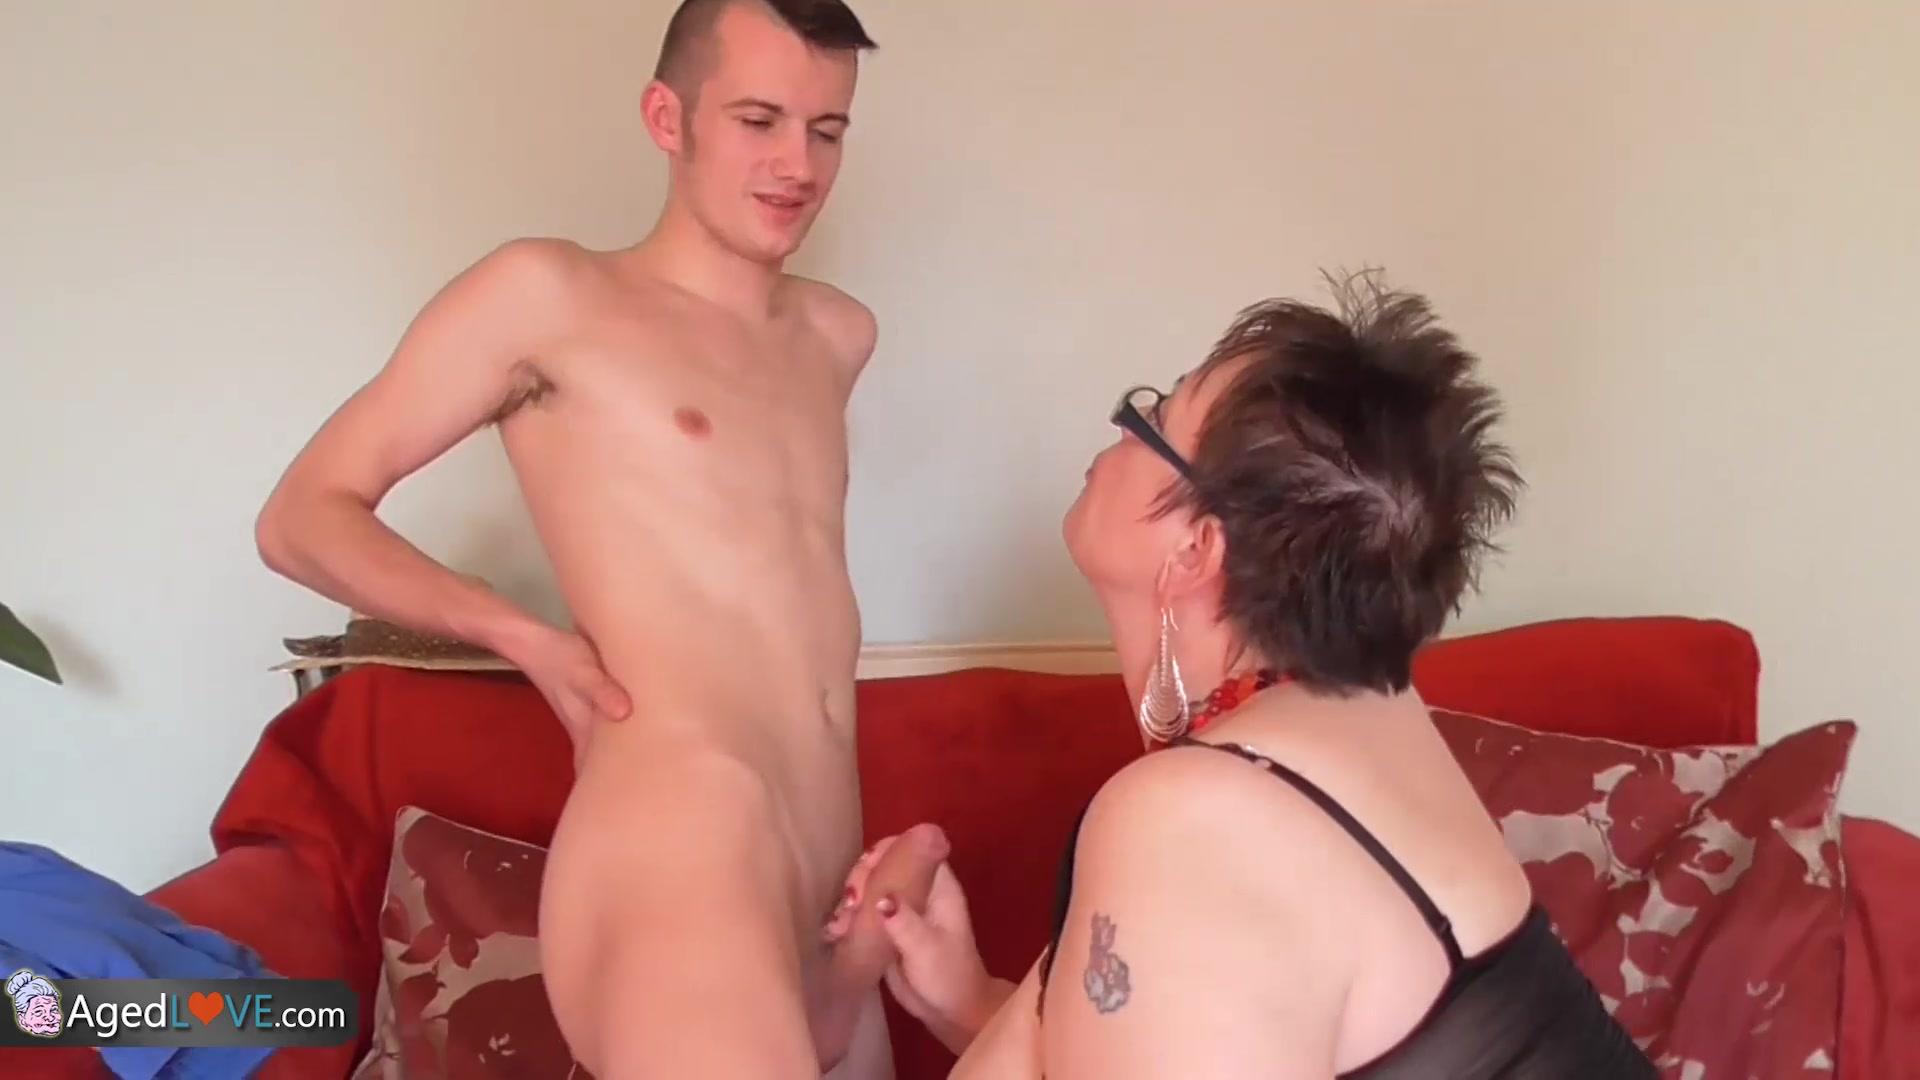 tranny oral cumshot tube Sex archive